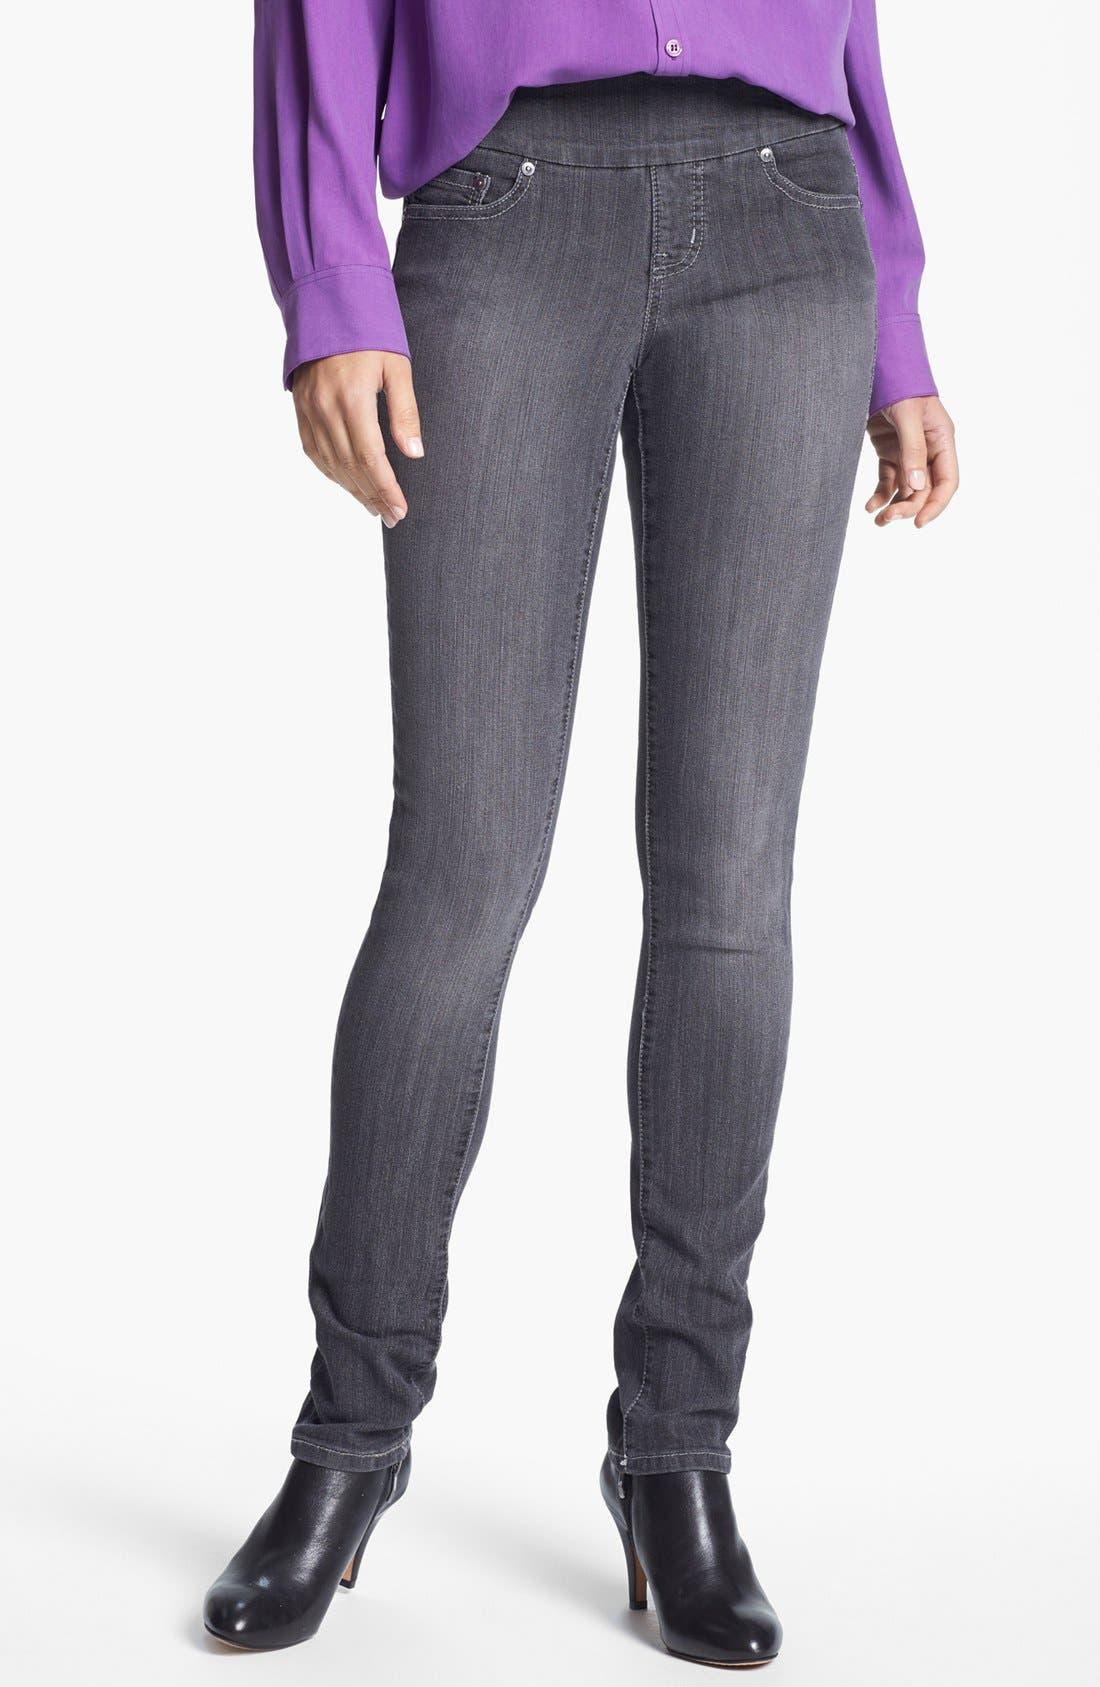 Main Image - Jag Jeans 'Malia' Slim Leg Stretch Jeans (Grey) (Petite)